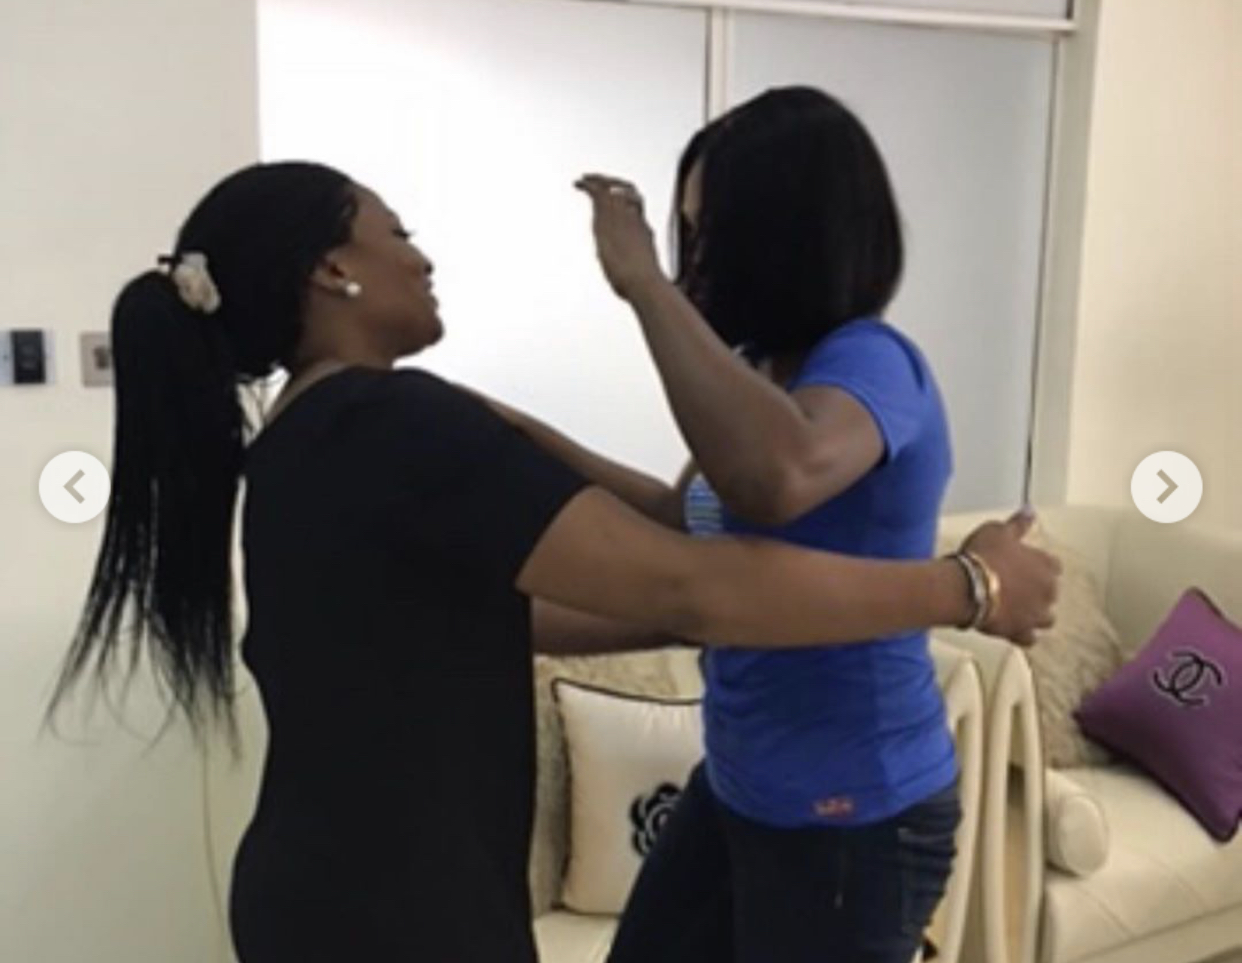 Ibidunni Ighodalo and Omoni Oboli